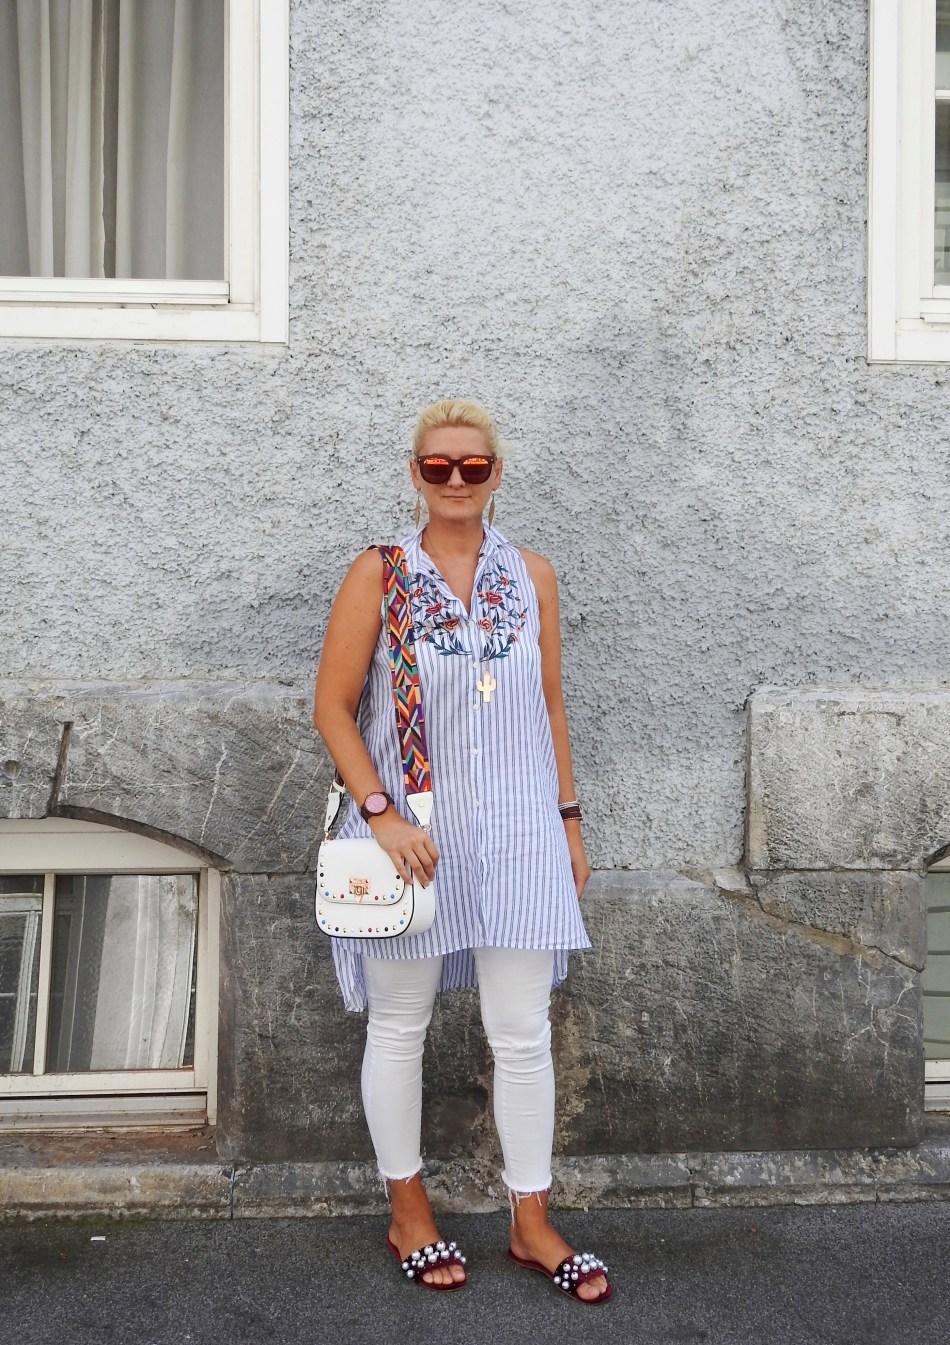 Vertical-Striped-Blouse-white-Pants-Miumiu-Sandals-Valentino-Rockstud-Bag-carrieslifestyle-Tamara-Prutsch